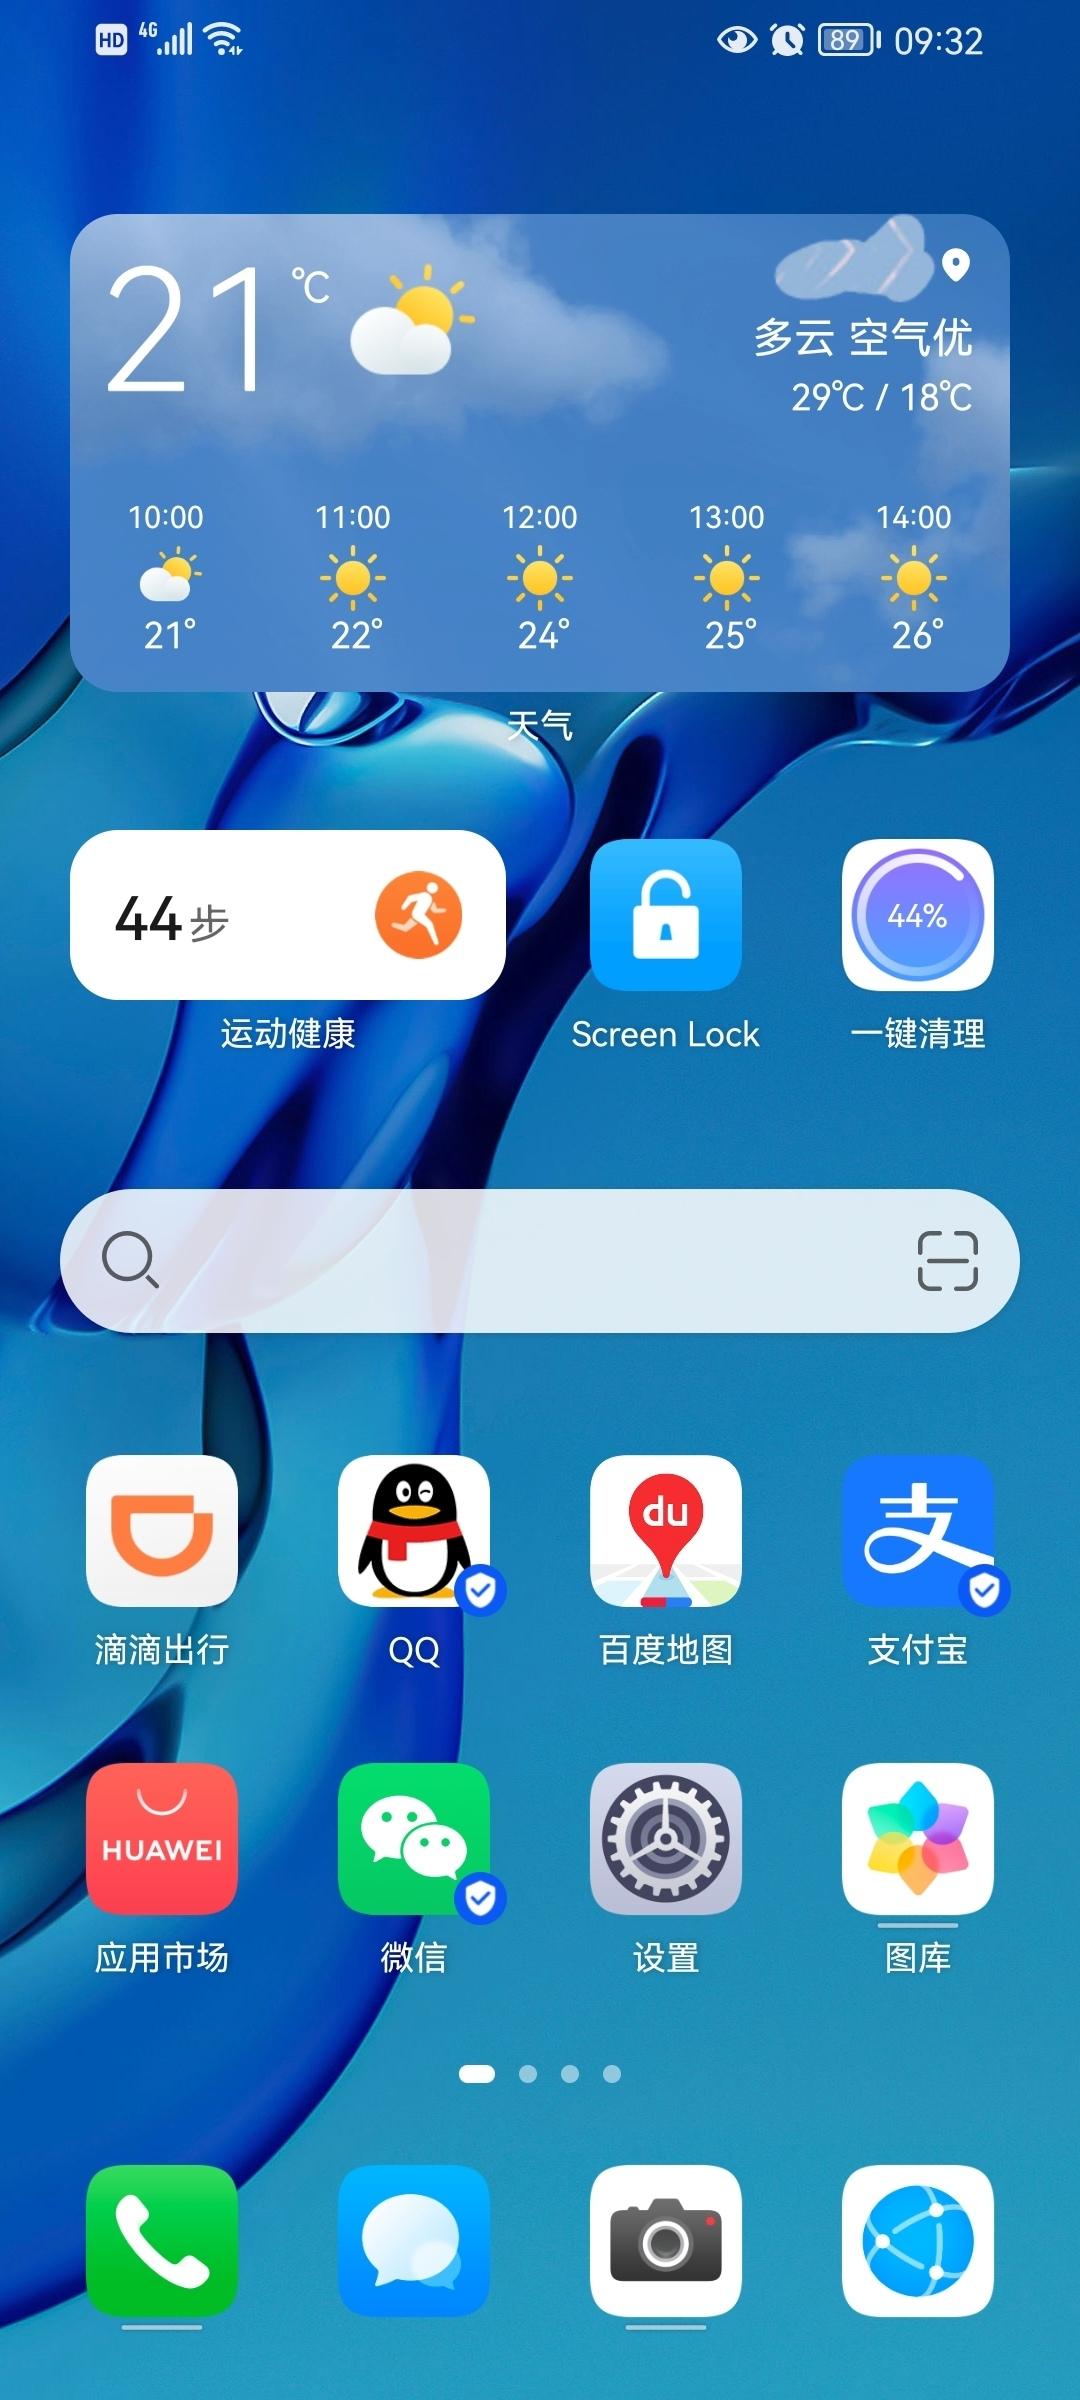 Screenshot_20210919_093249_com.huawei.android.launcher_edit_2816612299048.jpg